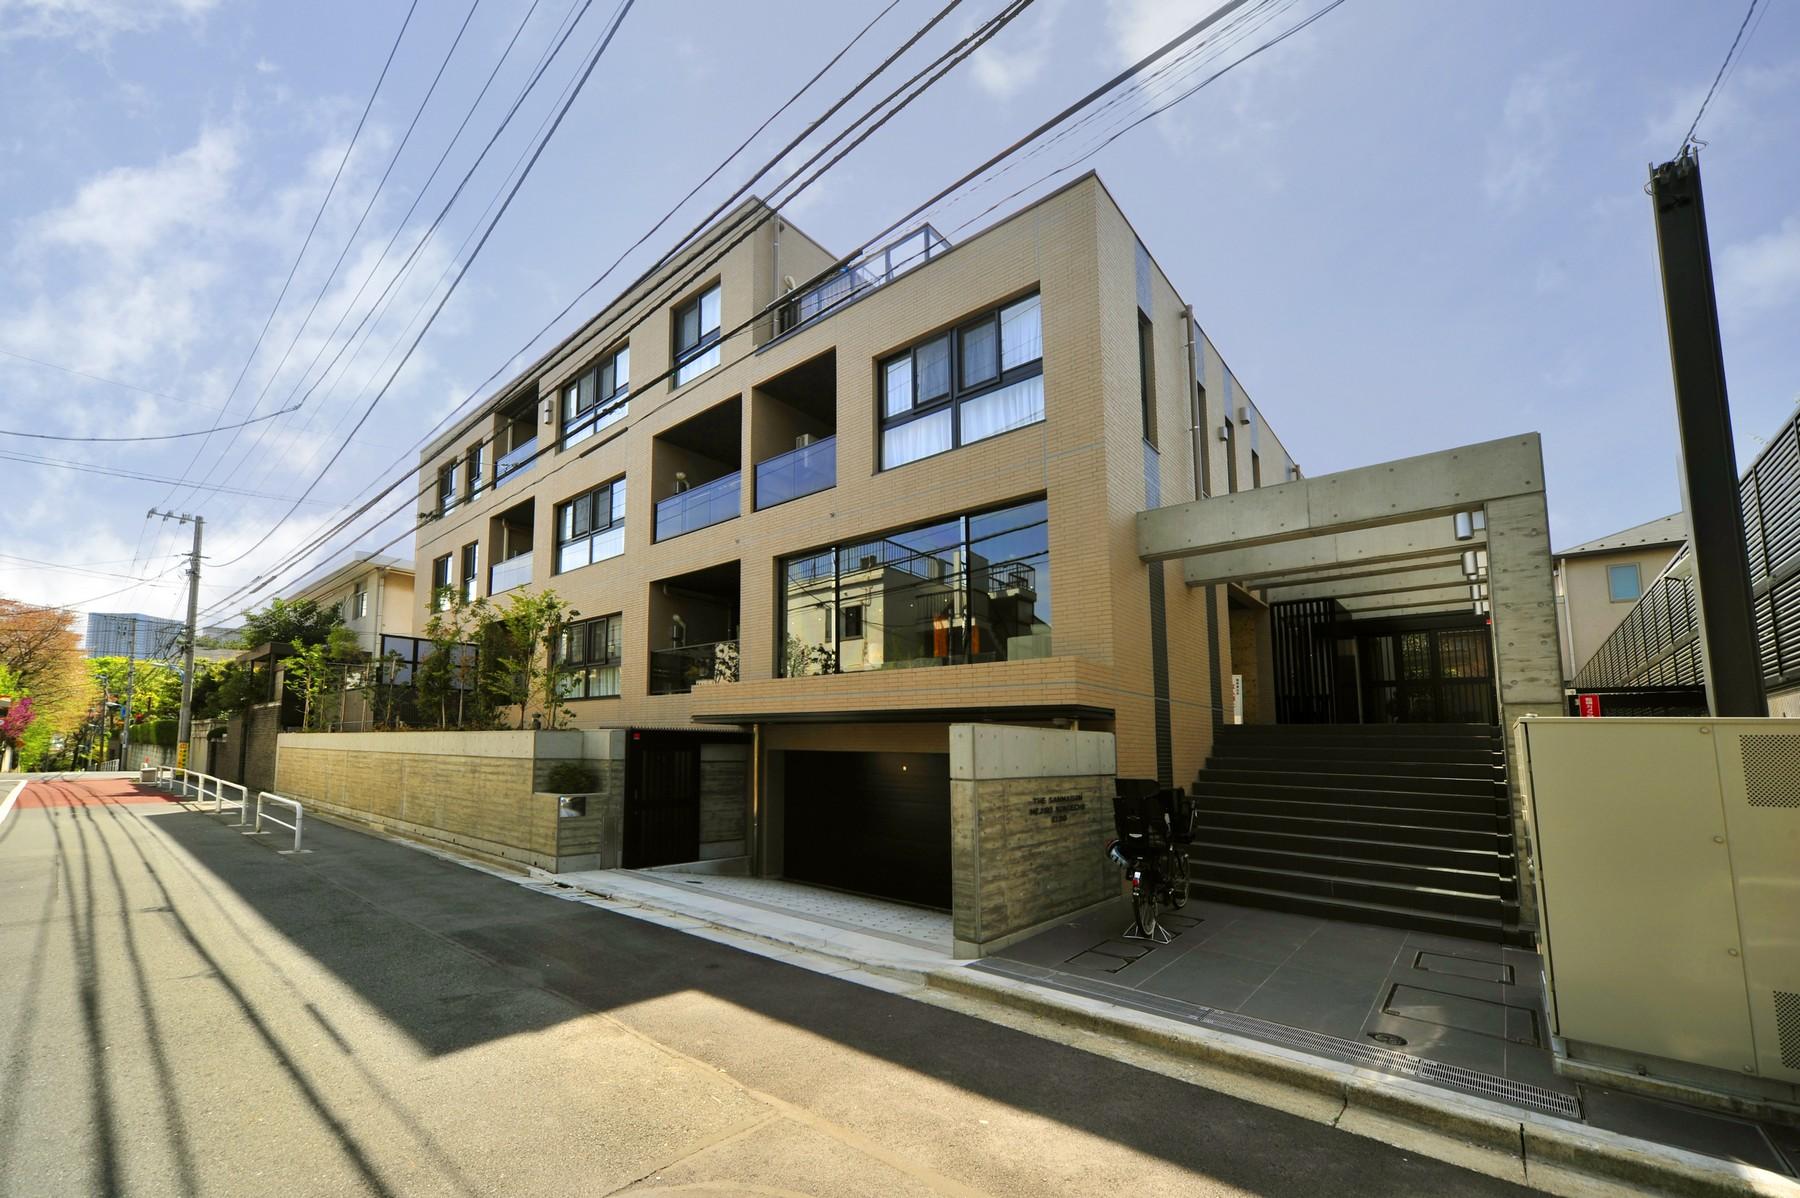 Appartamento per Vendita alle ore The Sanmaison Konoecho Eldo Shinjuku Ku, Tokyo, Giappone